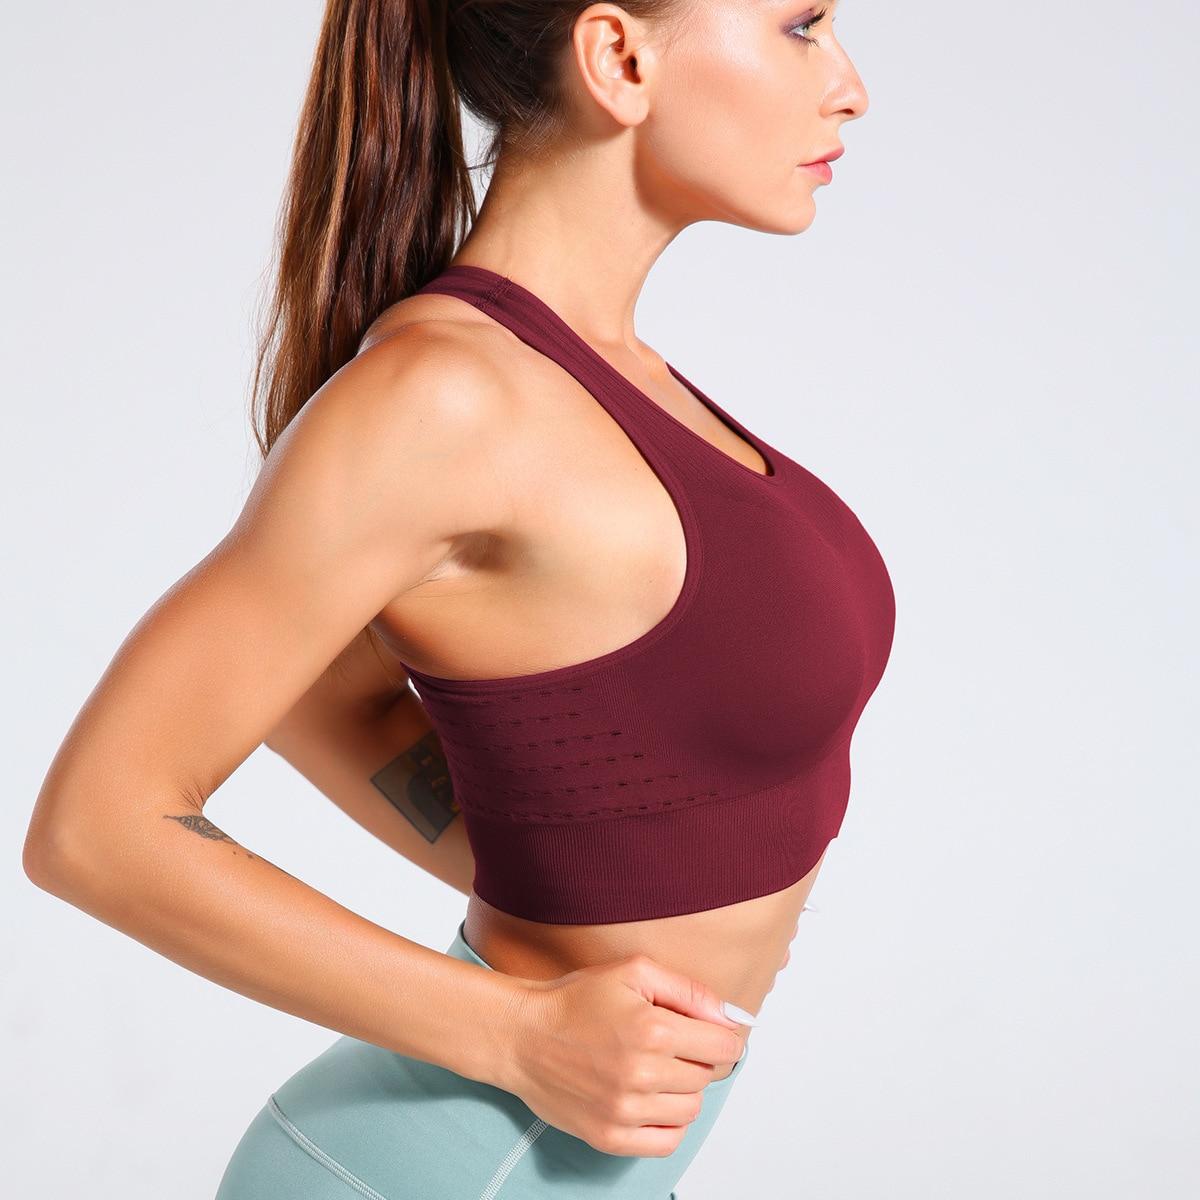 esporte t-camisa yoga ginásio camisas respirável roupas